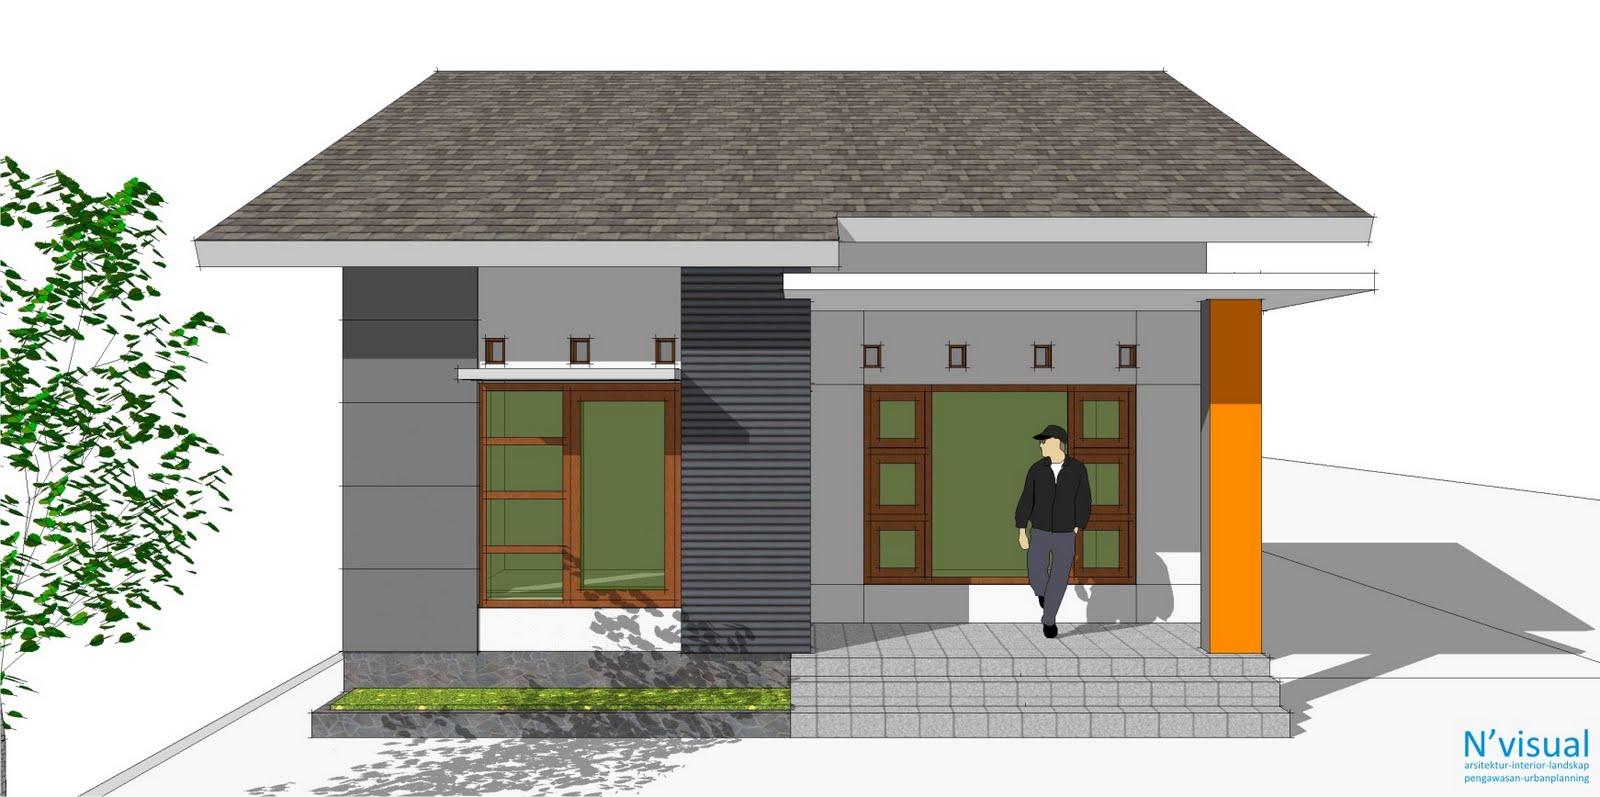 81 Gambar Rumah Minimalis Sederhana Ukuran 6x18 Terbaik